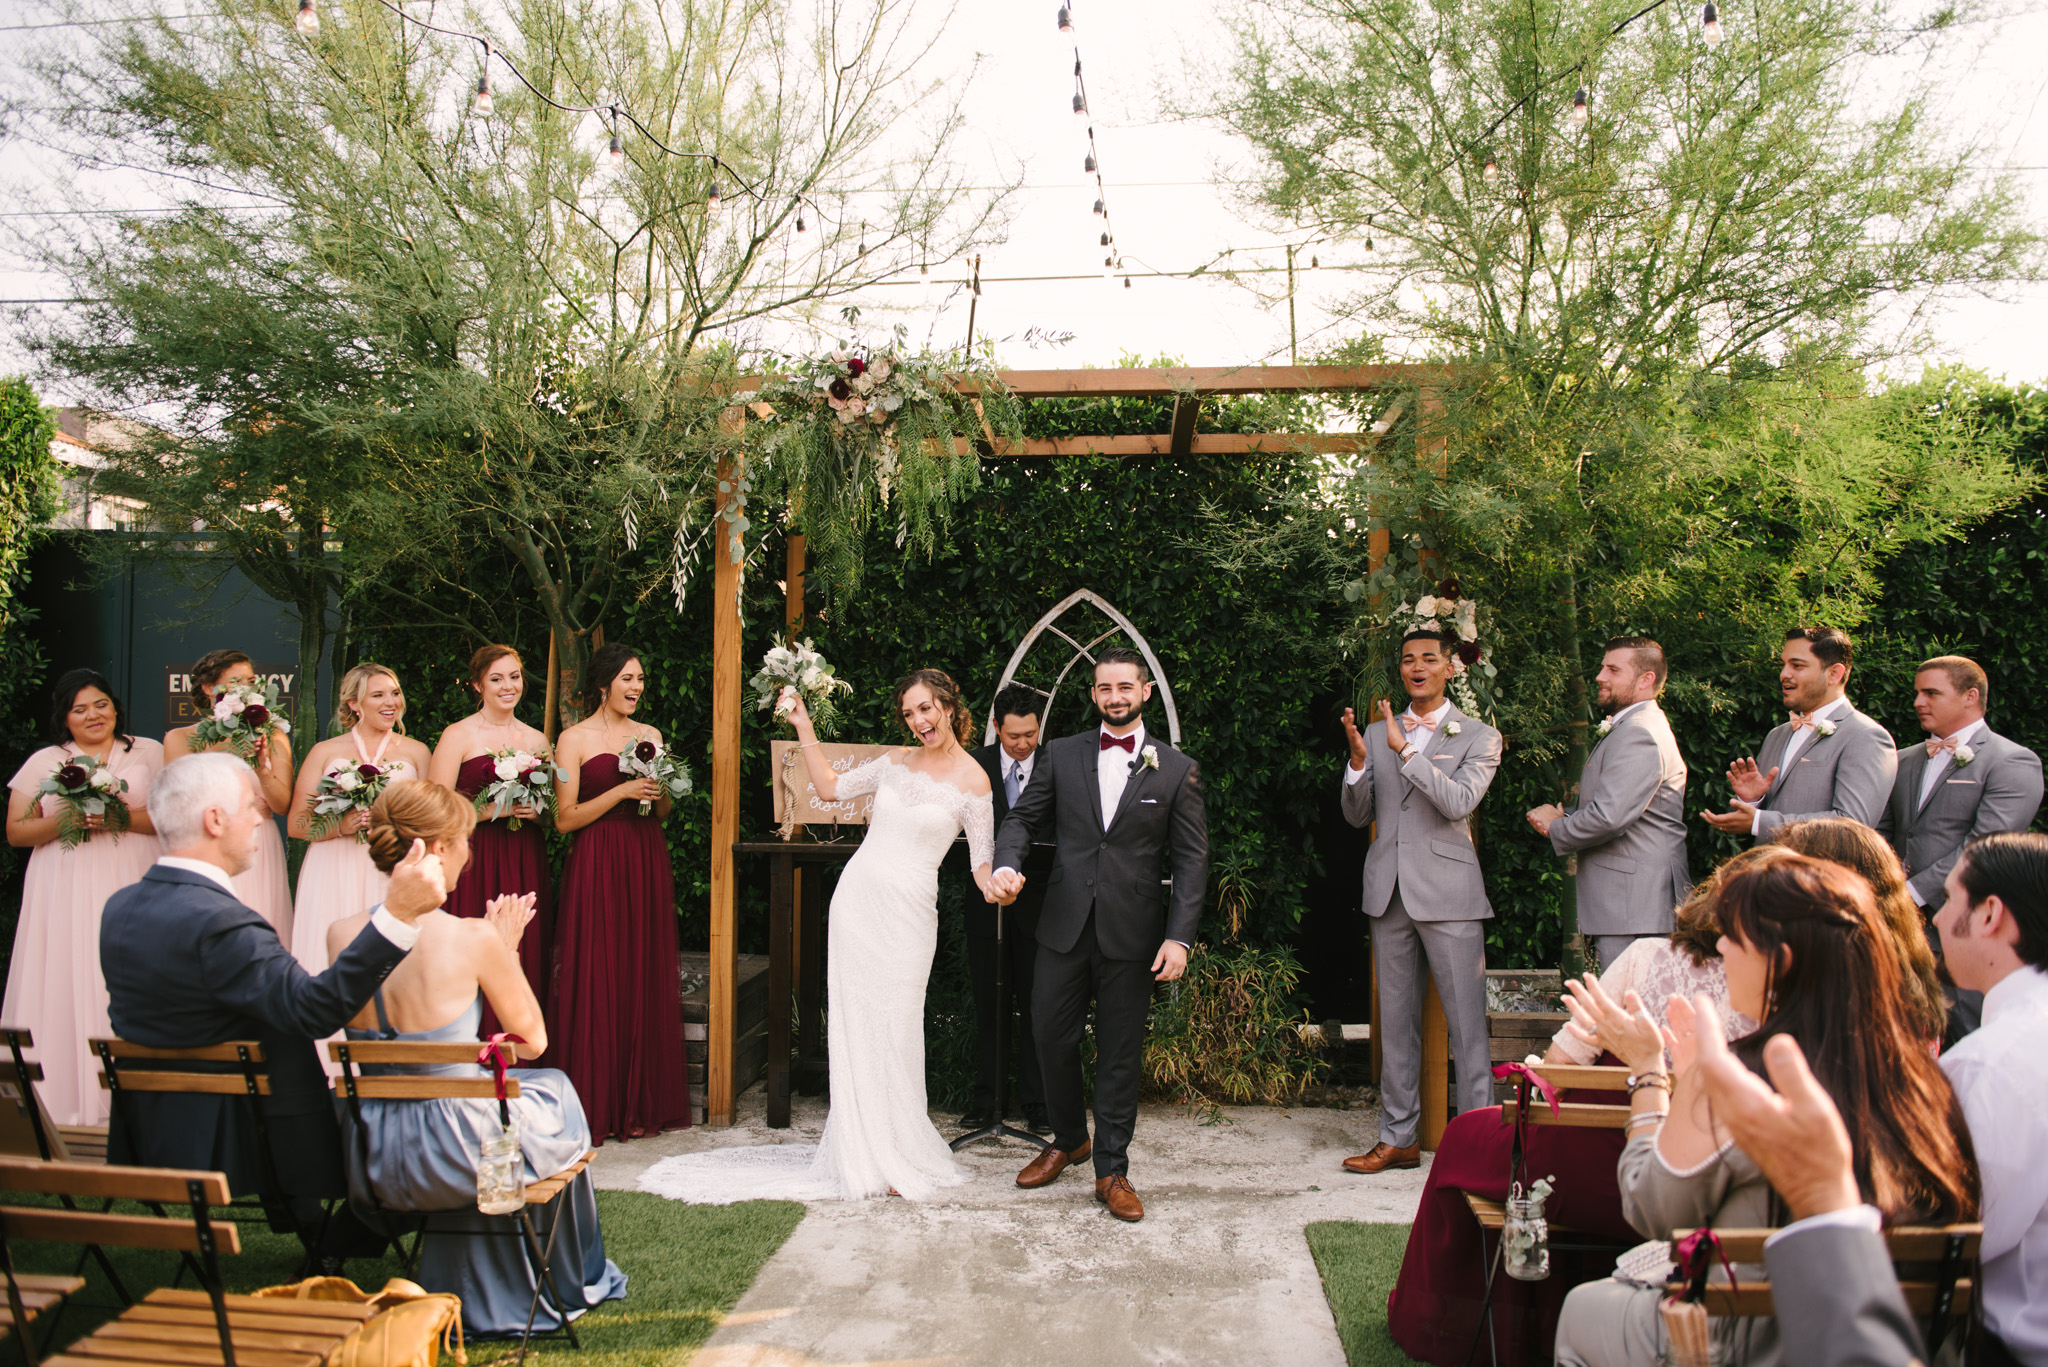 LJ-Ruby-Street-Los-Angeles-County-Wedding-Photography-7